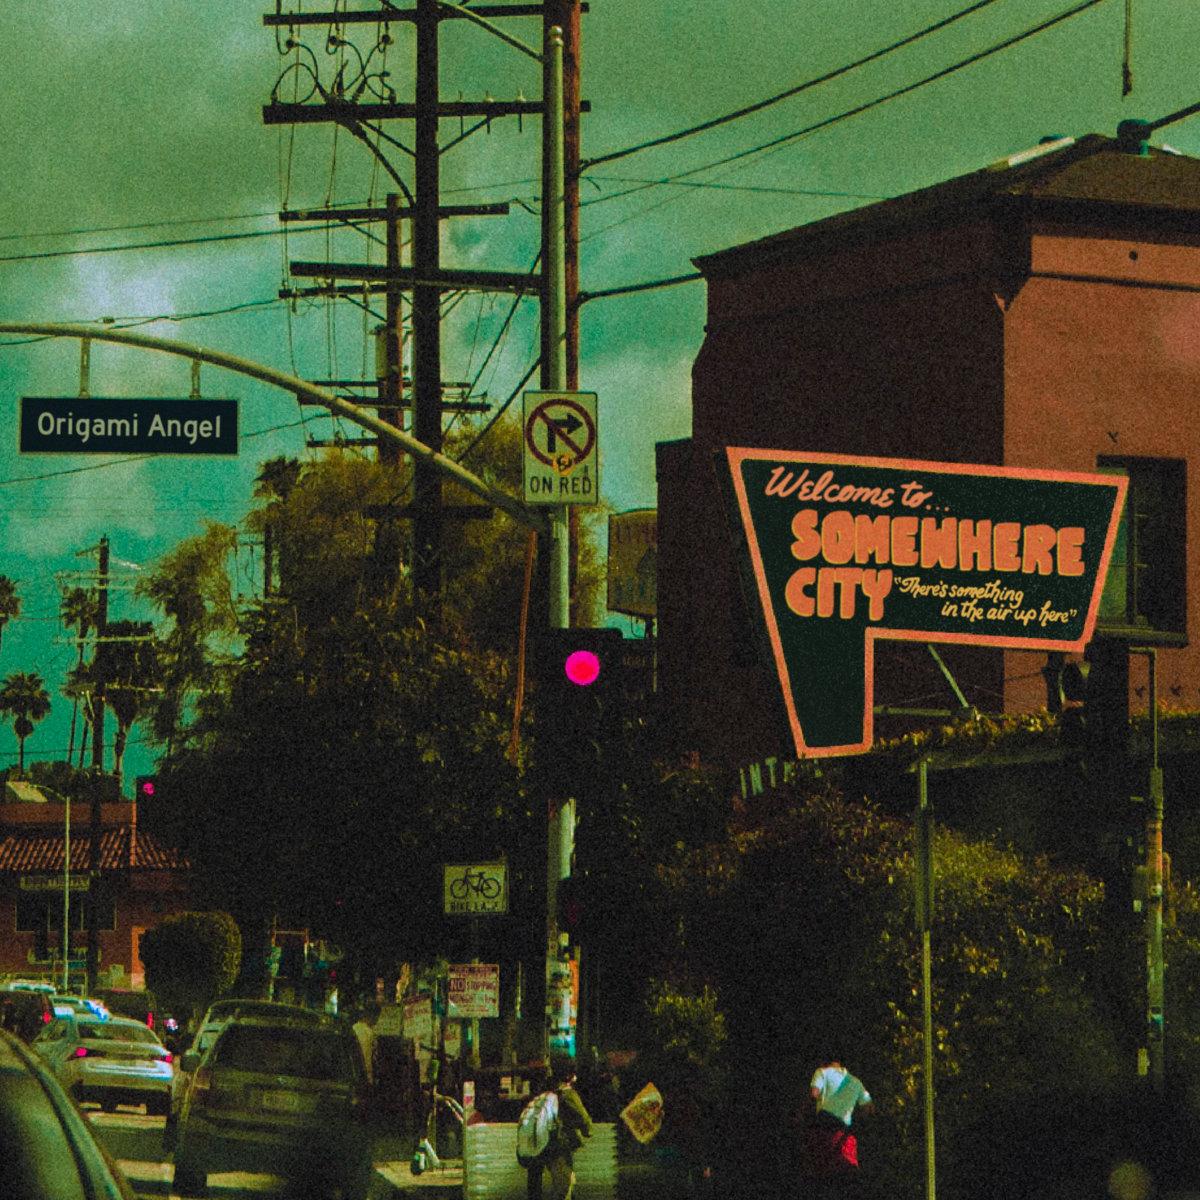 Origami Angel - Somewhere City LP